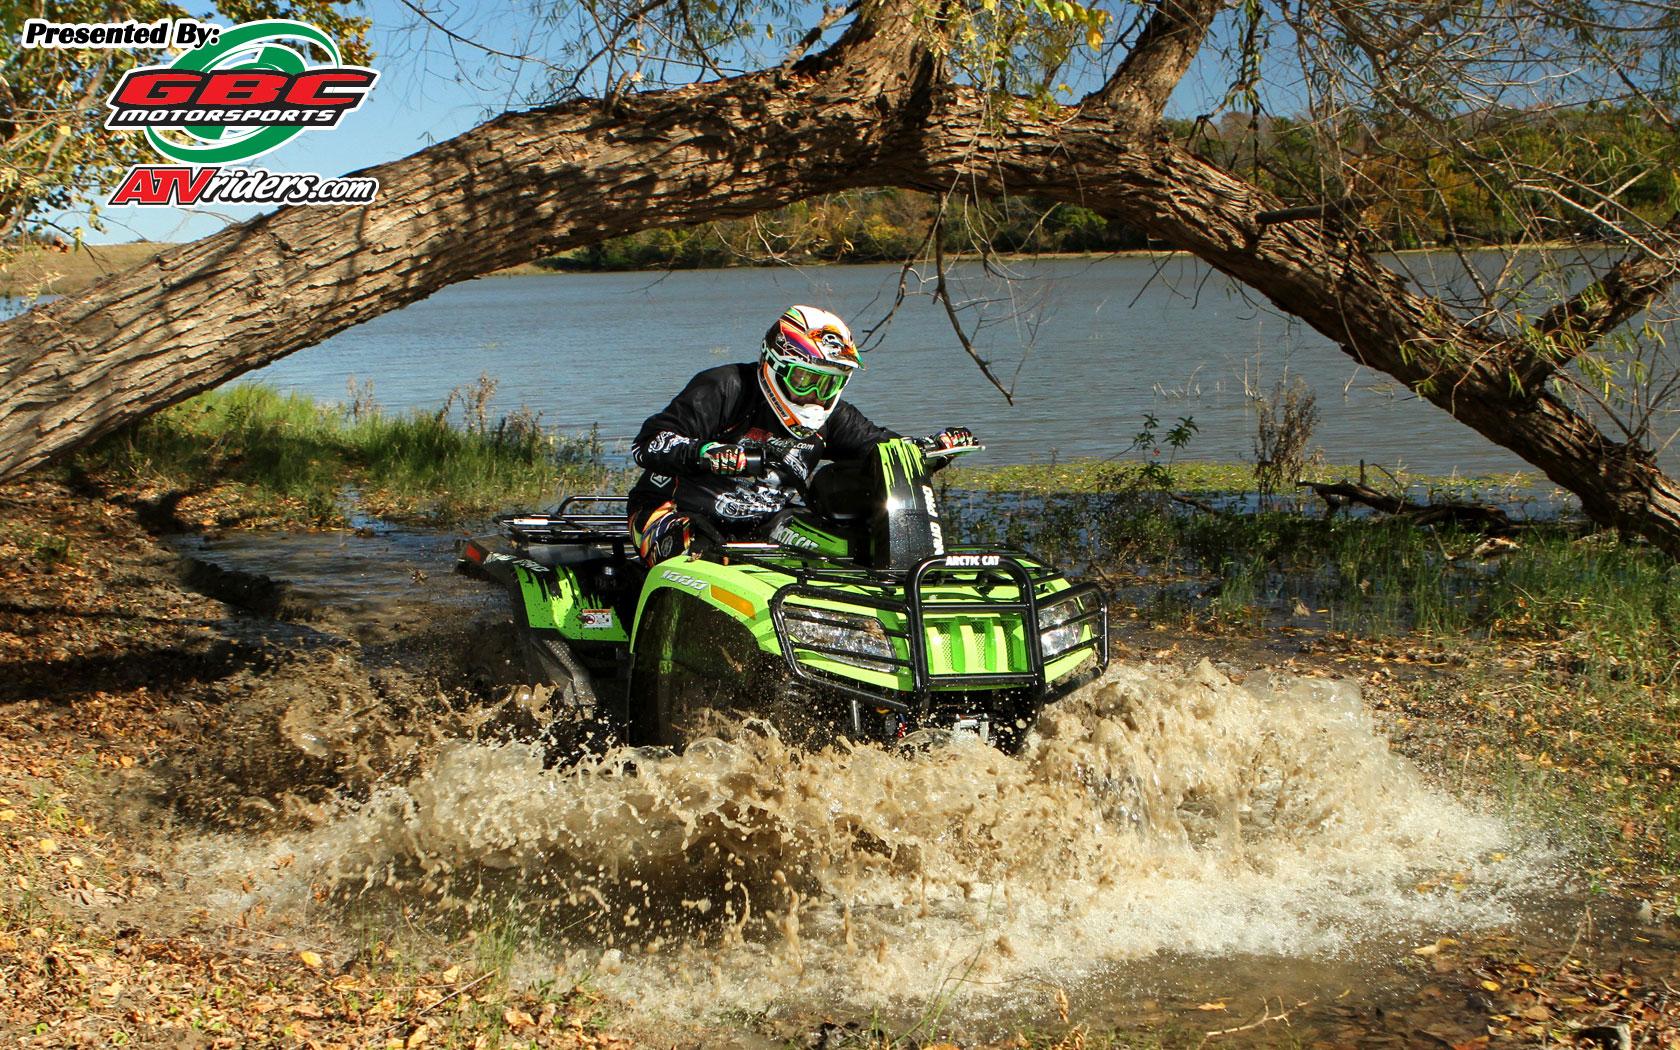 2011 Arctic Cat Mud Pro 1000 4x4 Utility ATV   Wednesday Wallpapers 1680x1050